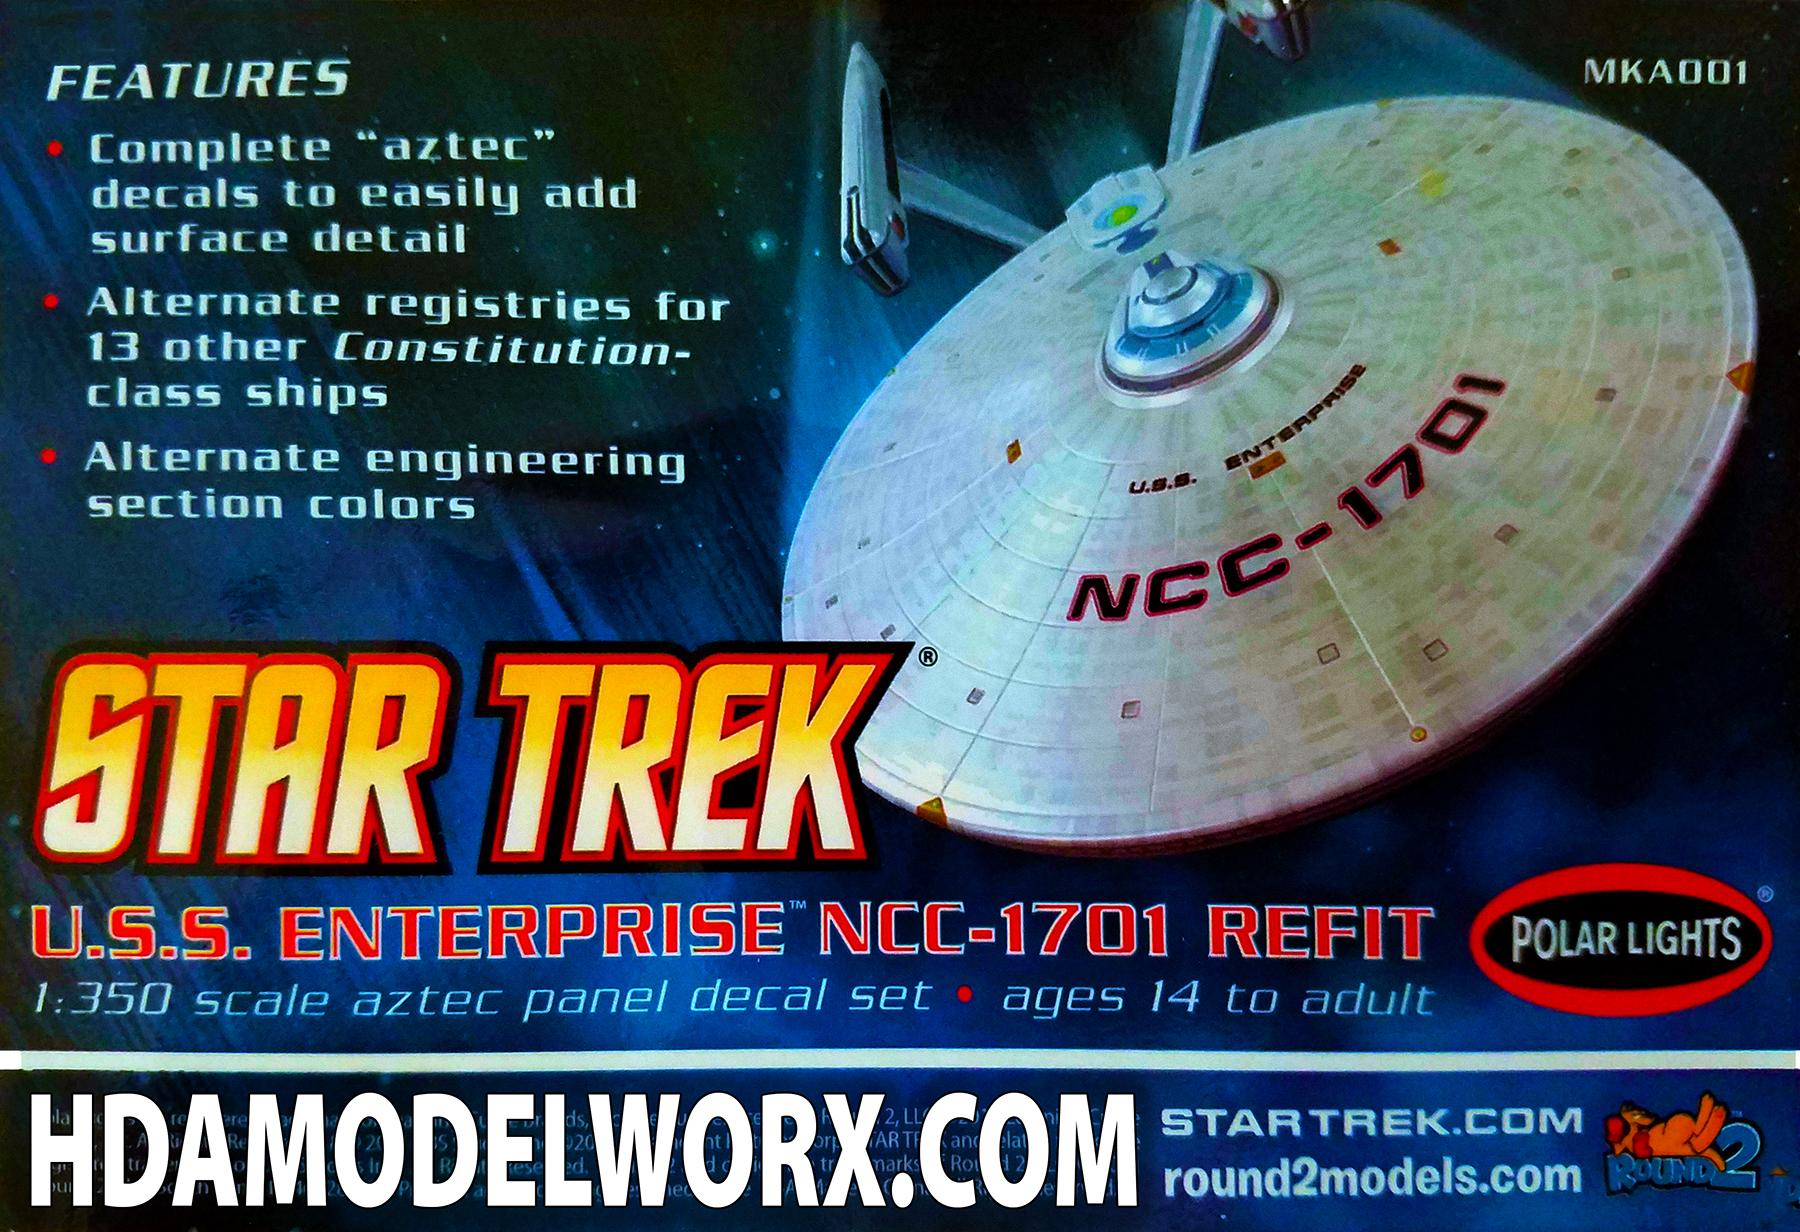 Star trek uss enterprise ncc refit 1 scale model - Aztec Alternate Name Registries Strongbacks Decal Set For The U S S Enterprise Ncc 1701 Refit 1 350 Scale Model Kit